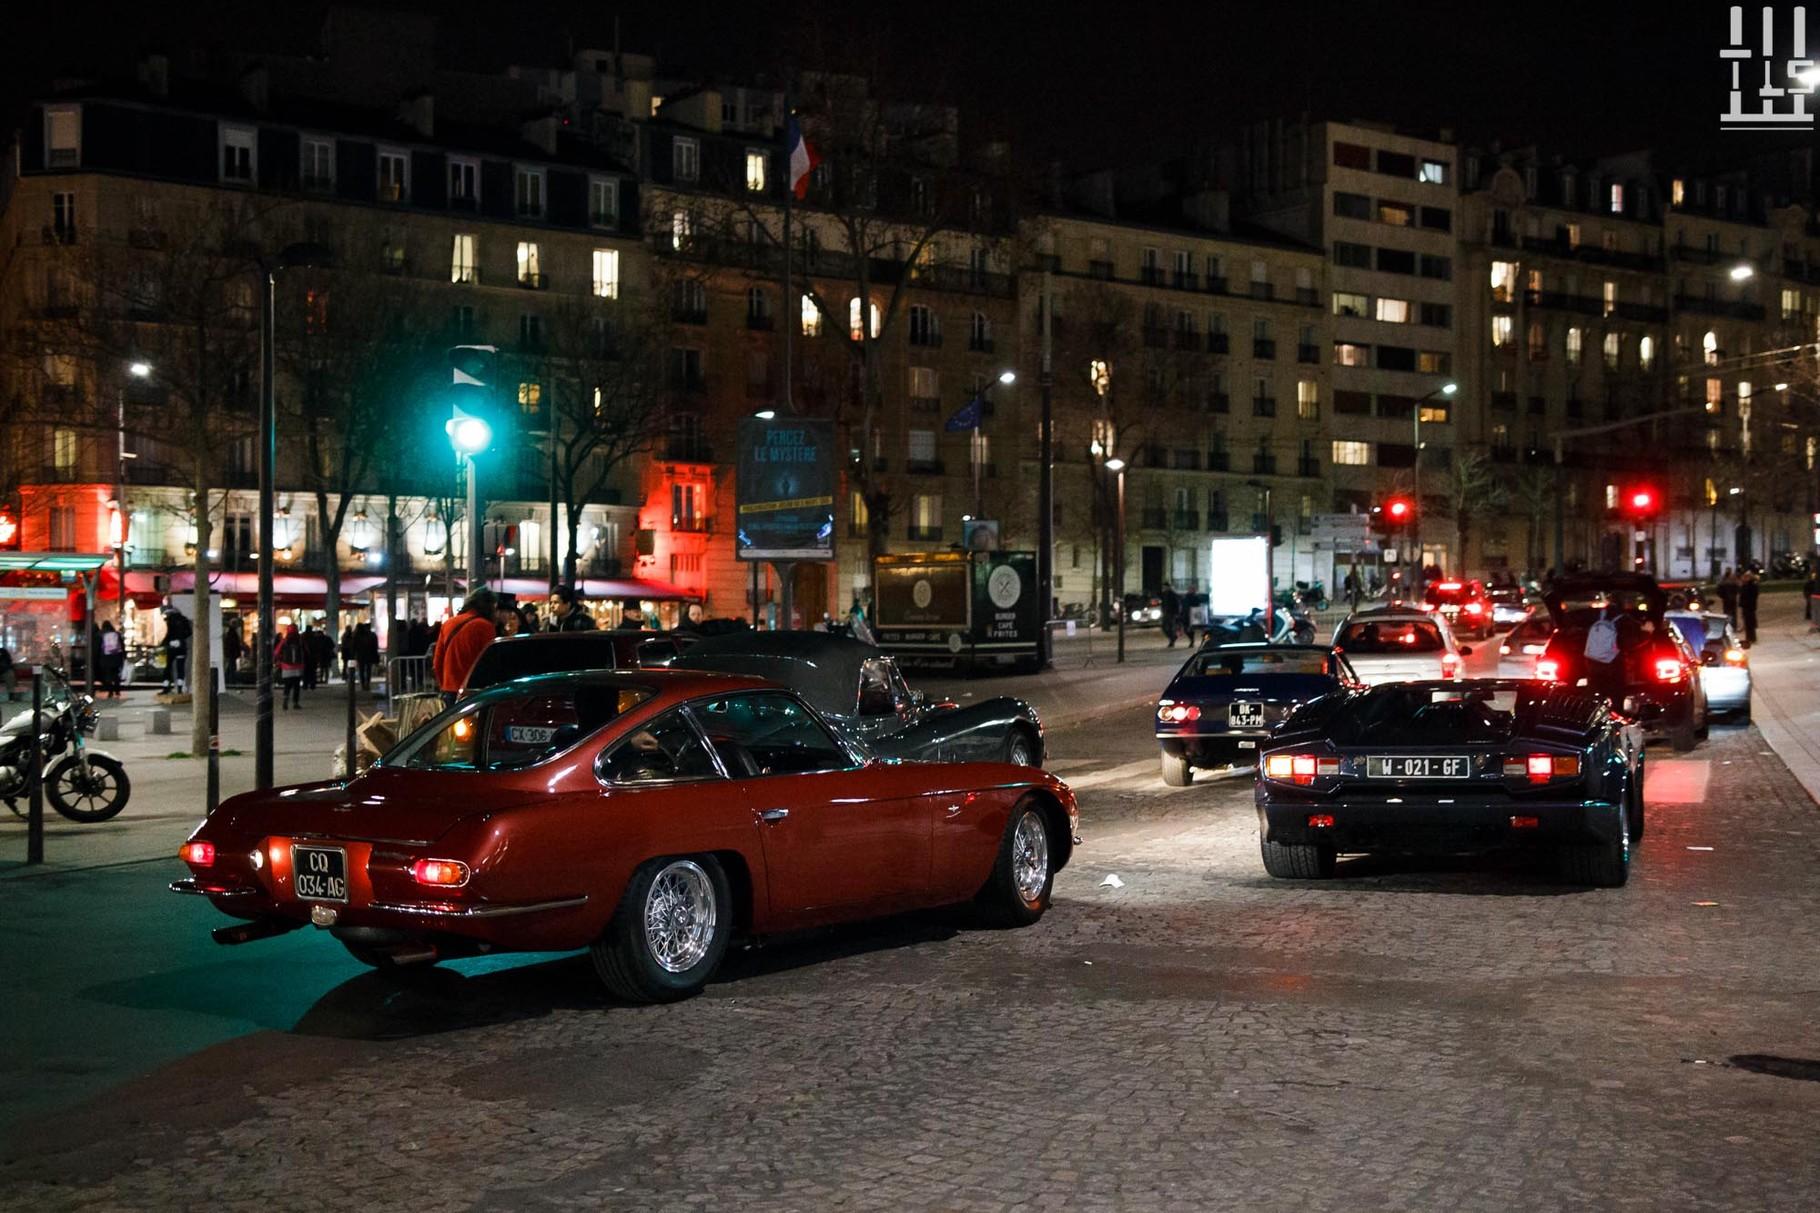 La troupe d'Eleven Cars dit adieu au salon : Lamborghini 350 GT, Lamborghini Countach 25th Anniversary, Ferrari 365 GTC/4.